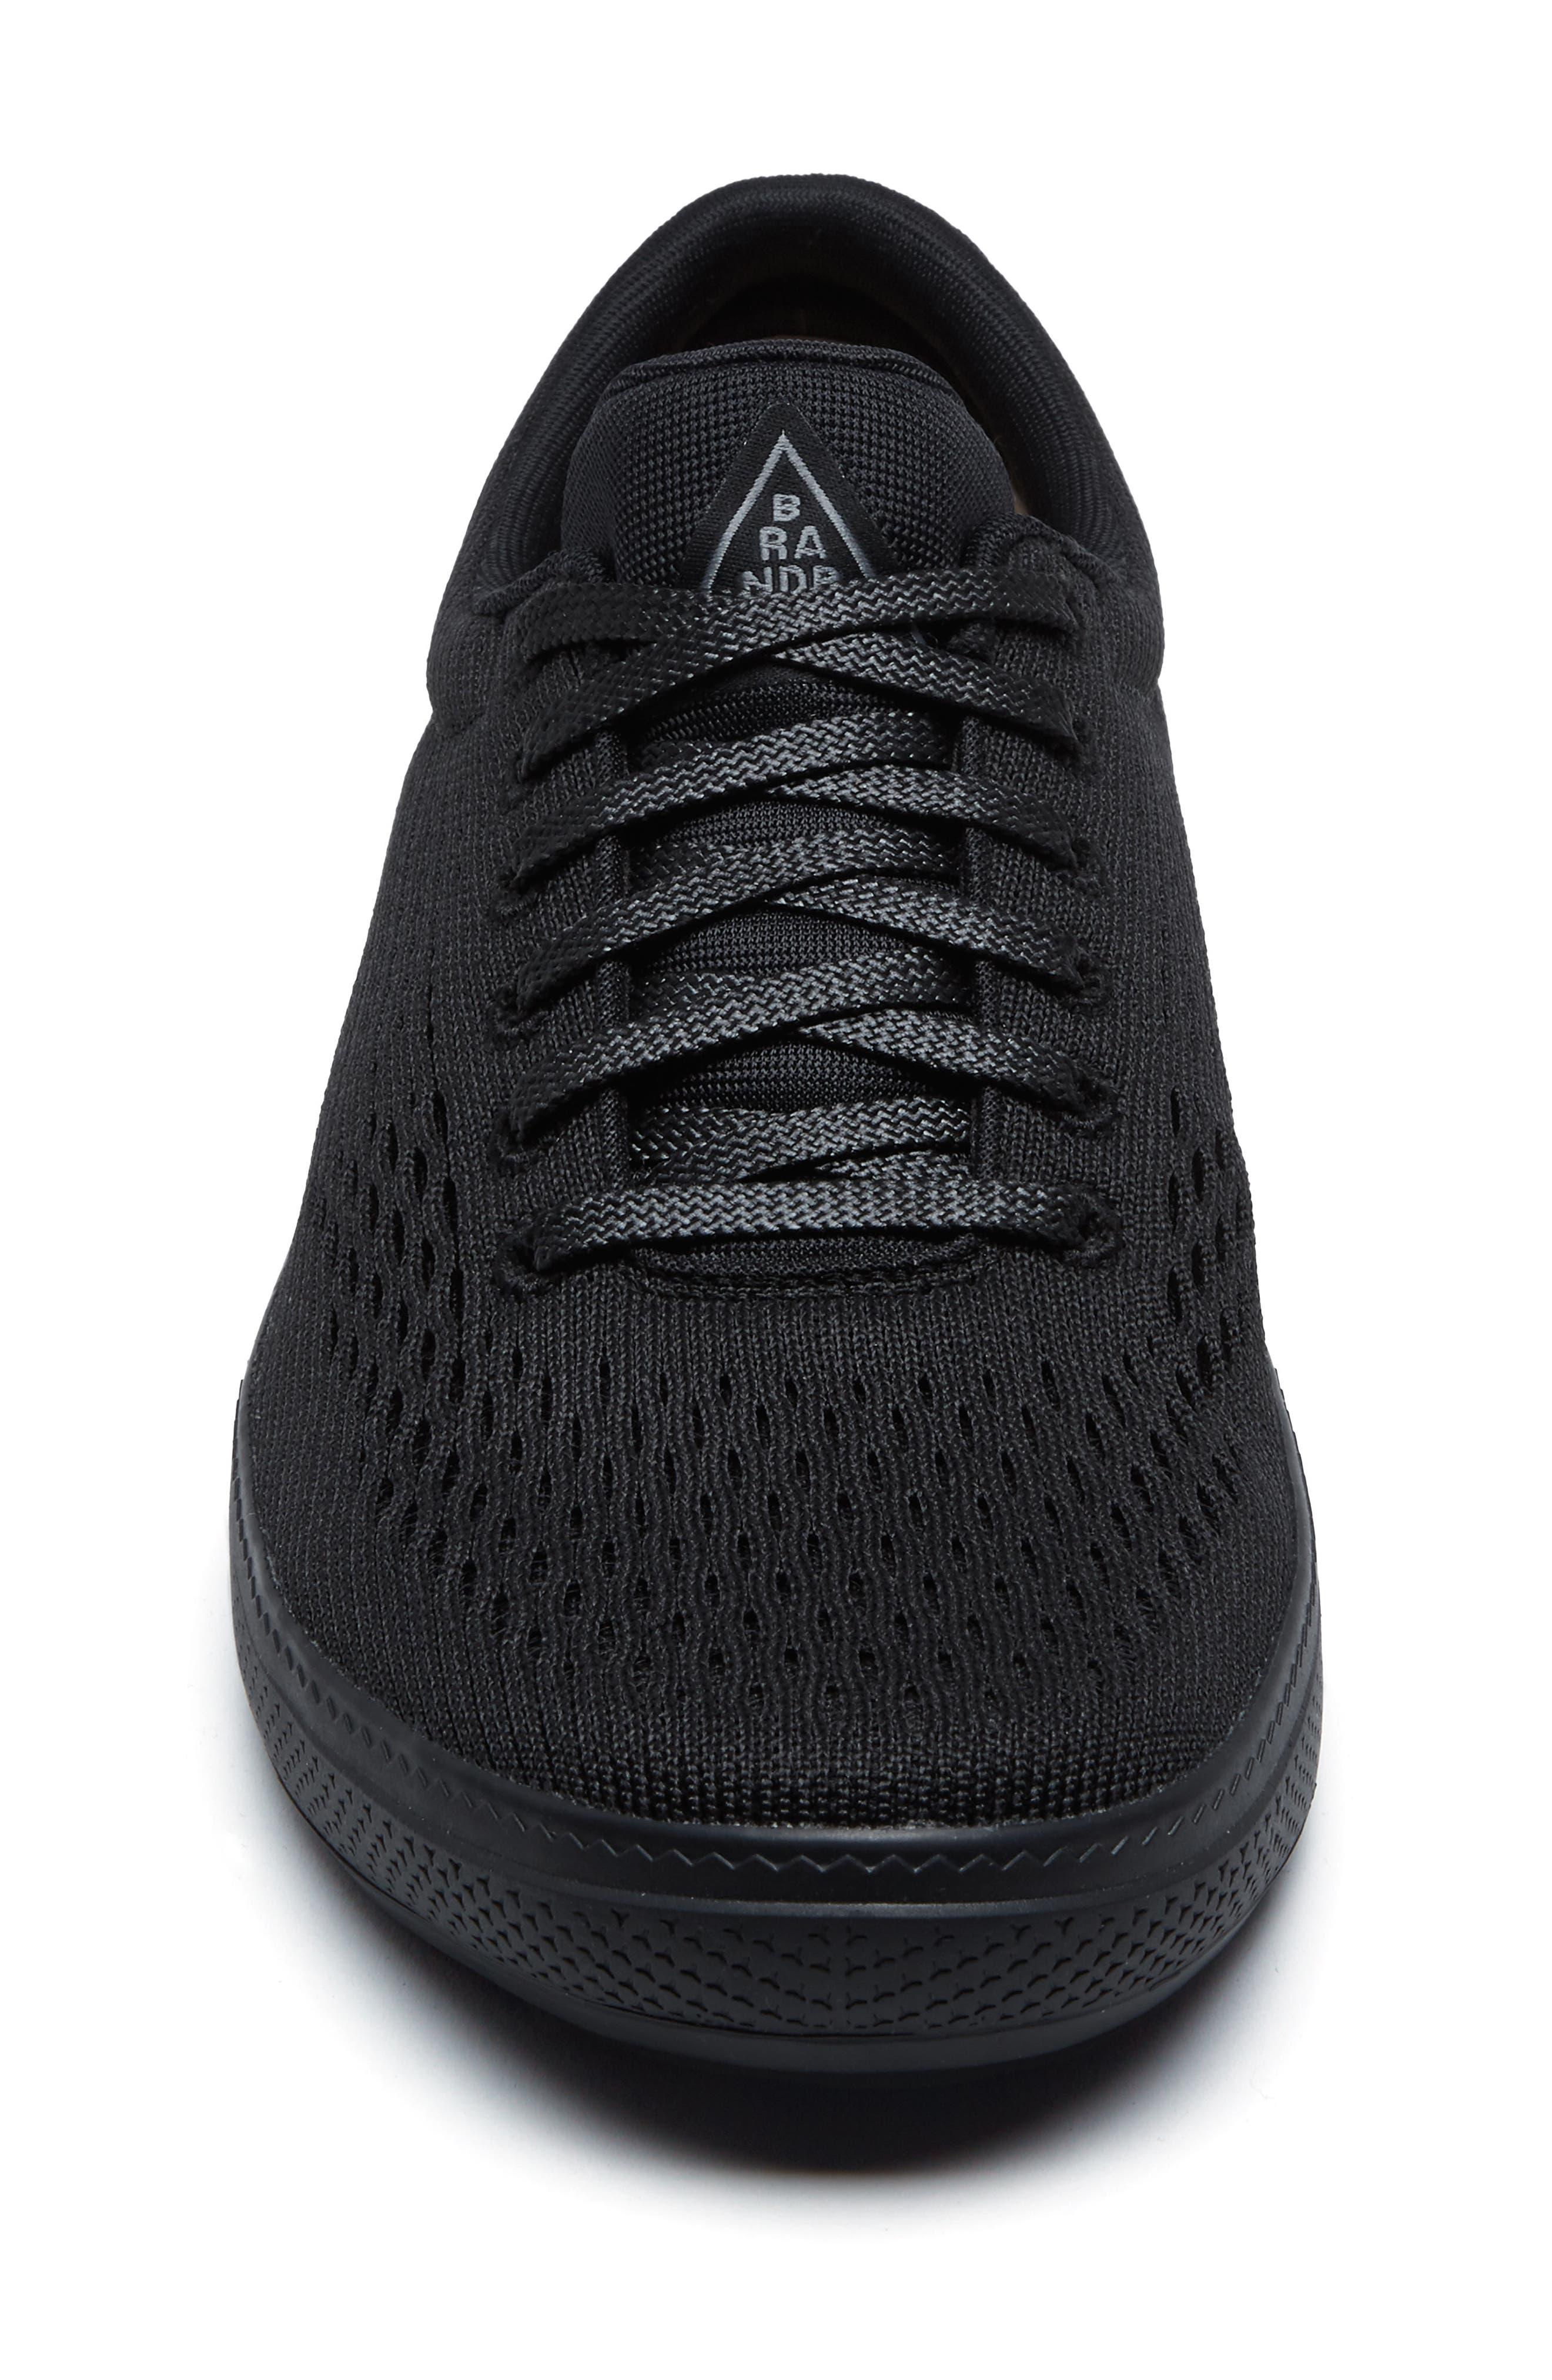 BRANDBLACK,                             August II Sneaker,                             Alternate thumbnail 4, color,                             007